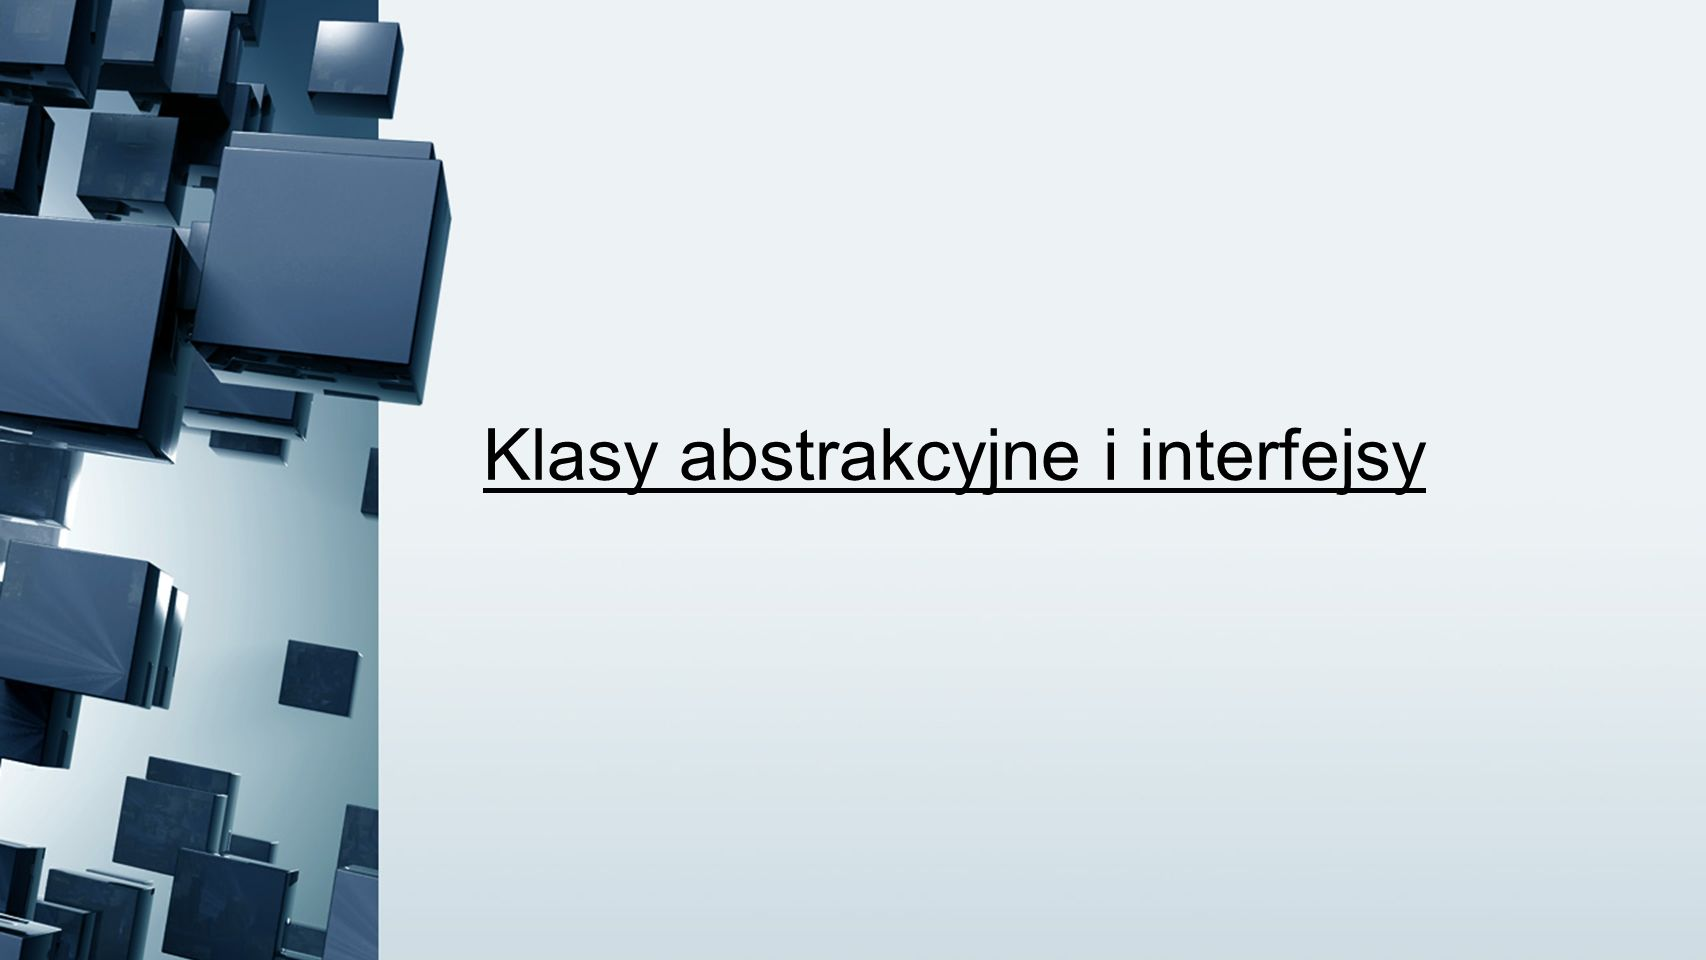 Klasy abstrakcyjne i interfejsy